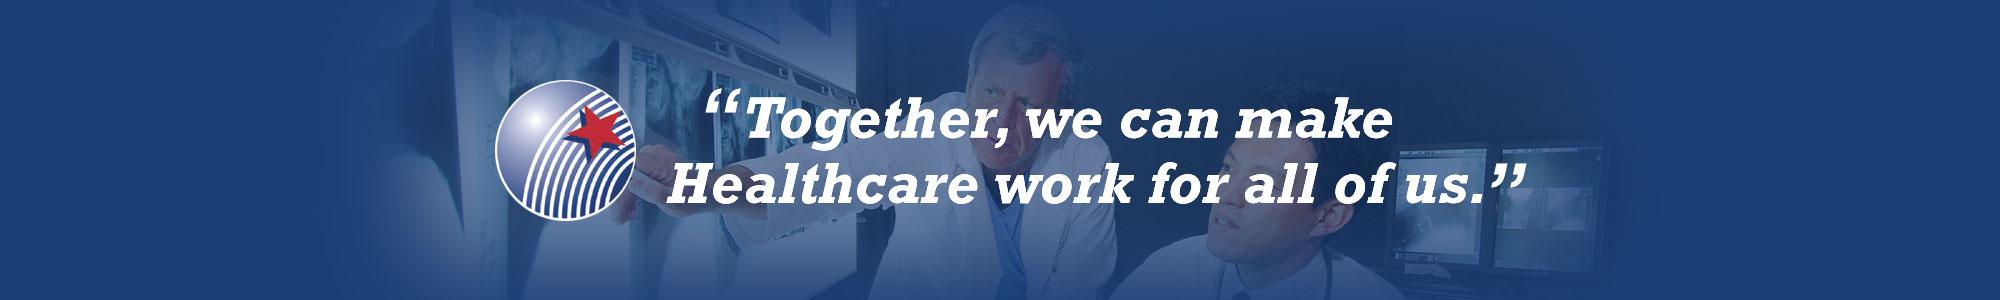 banner-together-we-can-make-healthcare-work-for-us